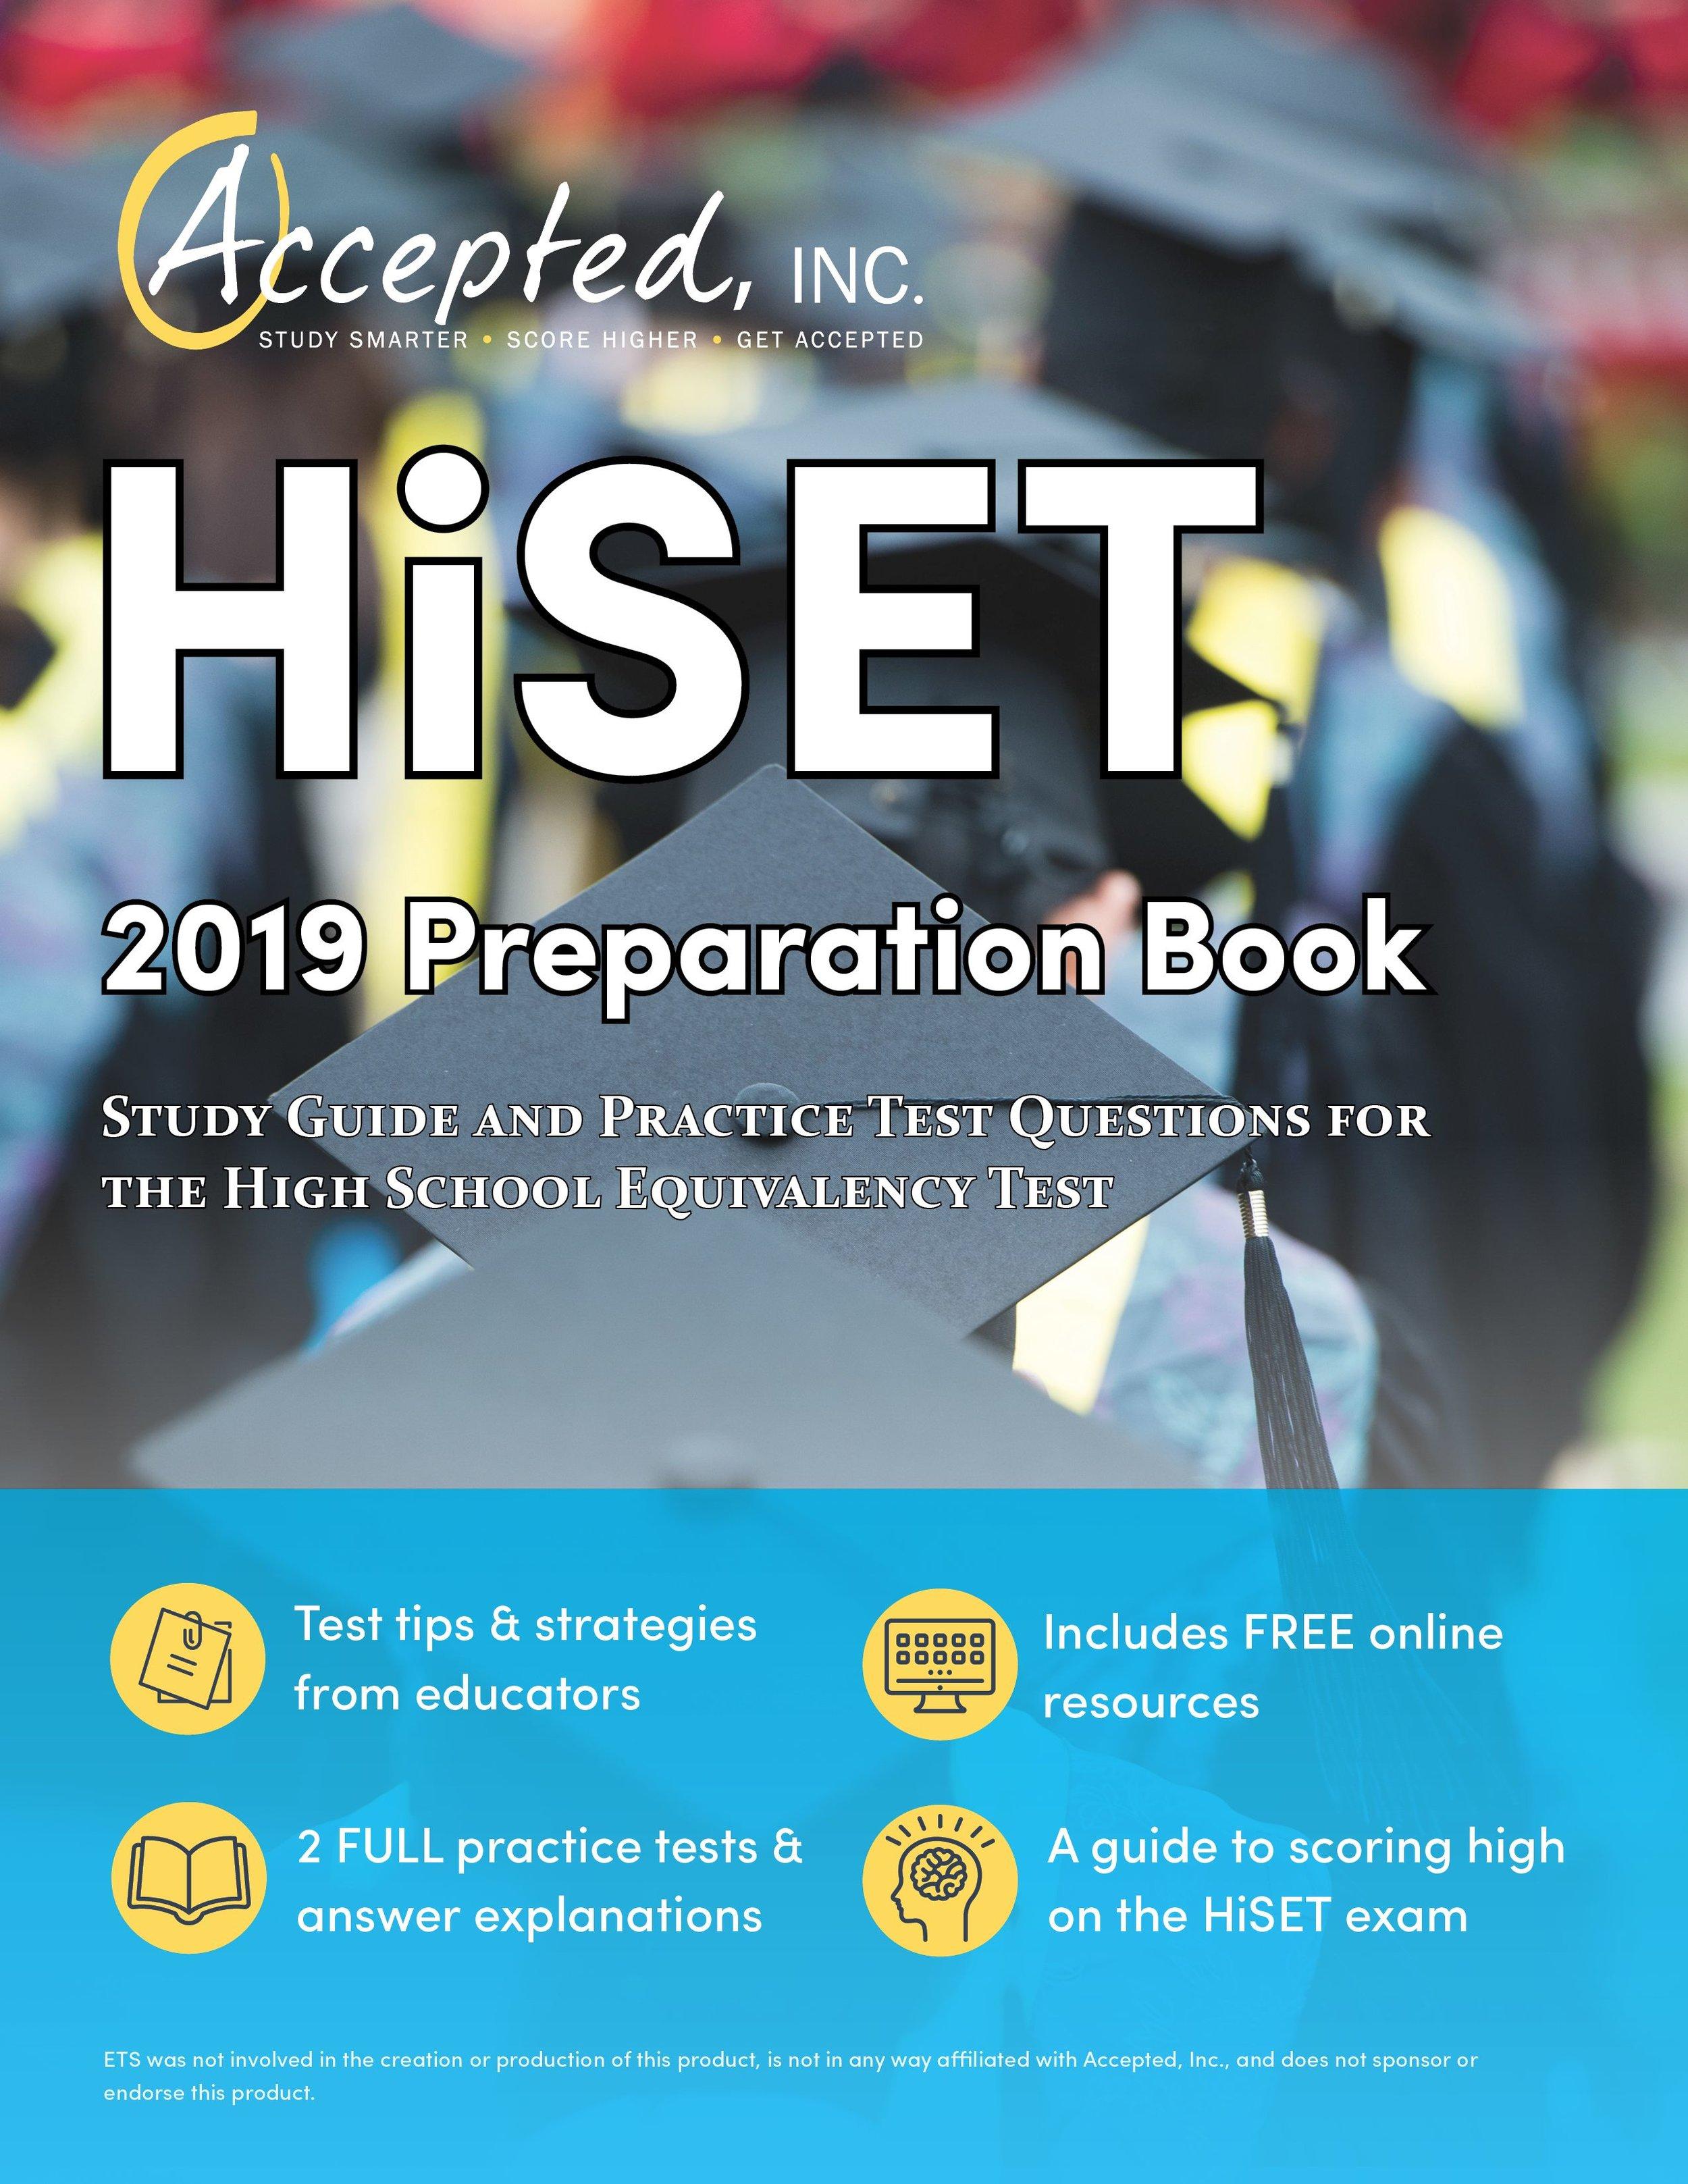 HiSET 2019 Preparation Book Study Guide